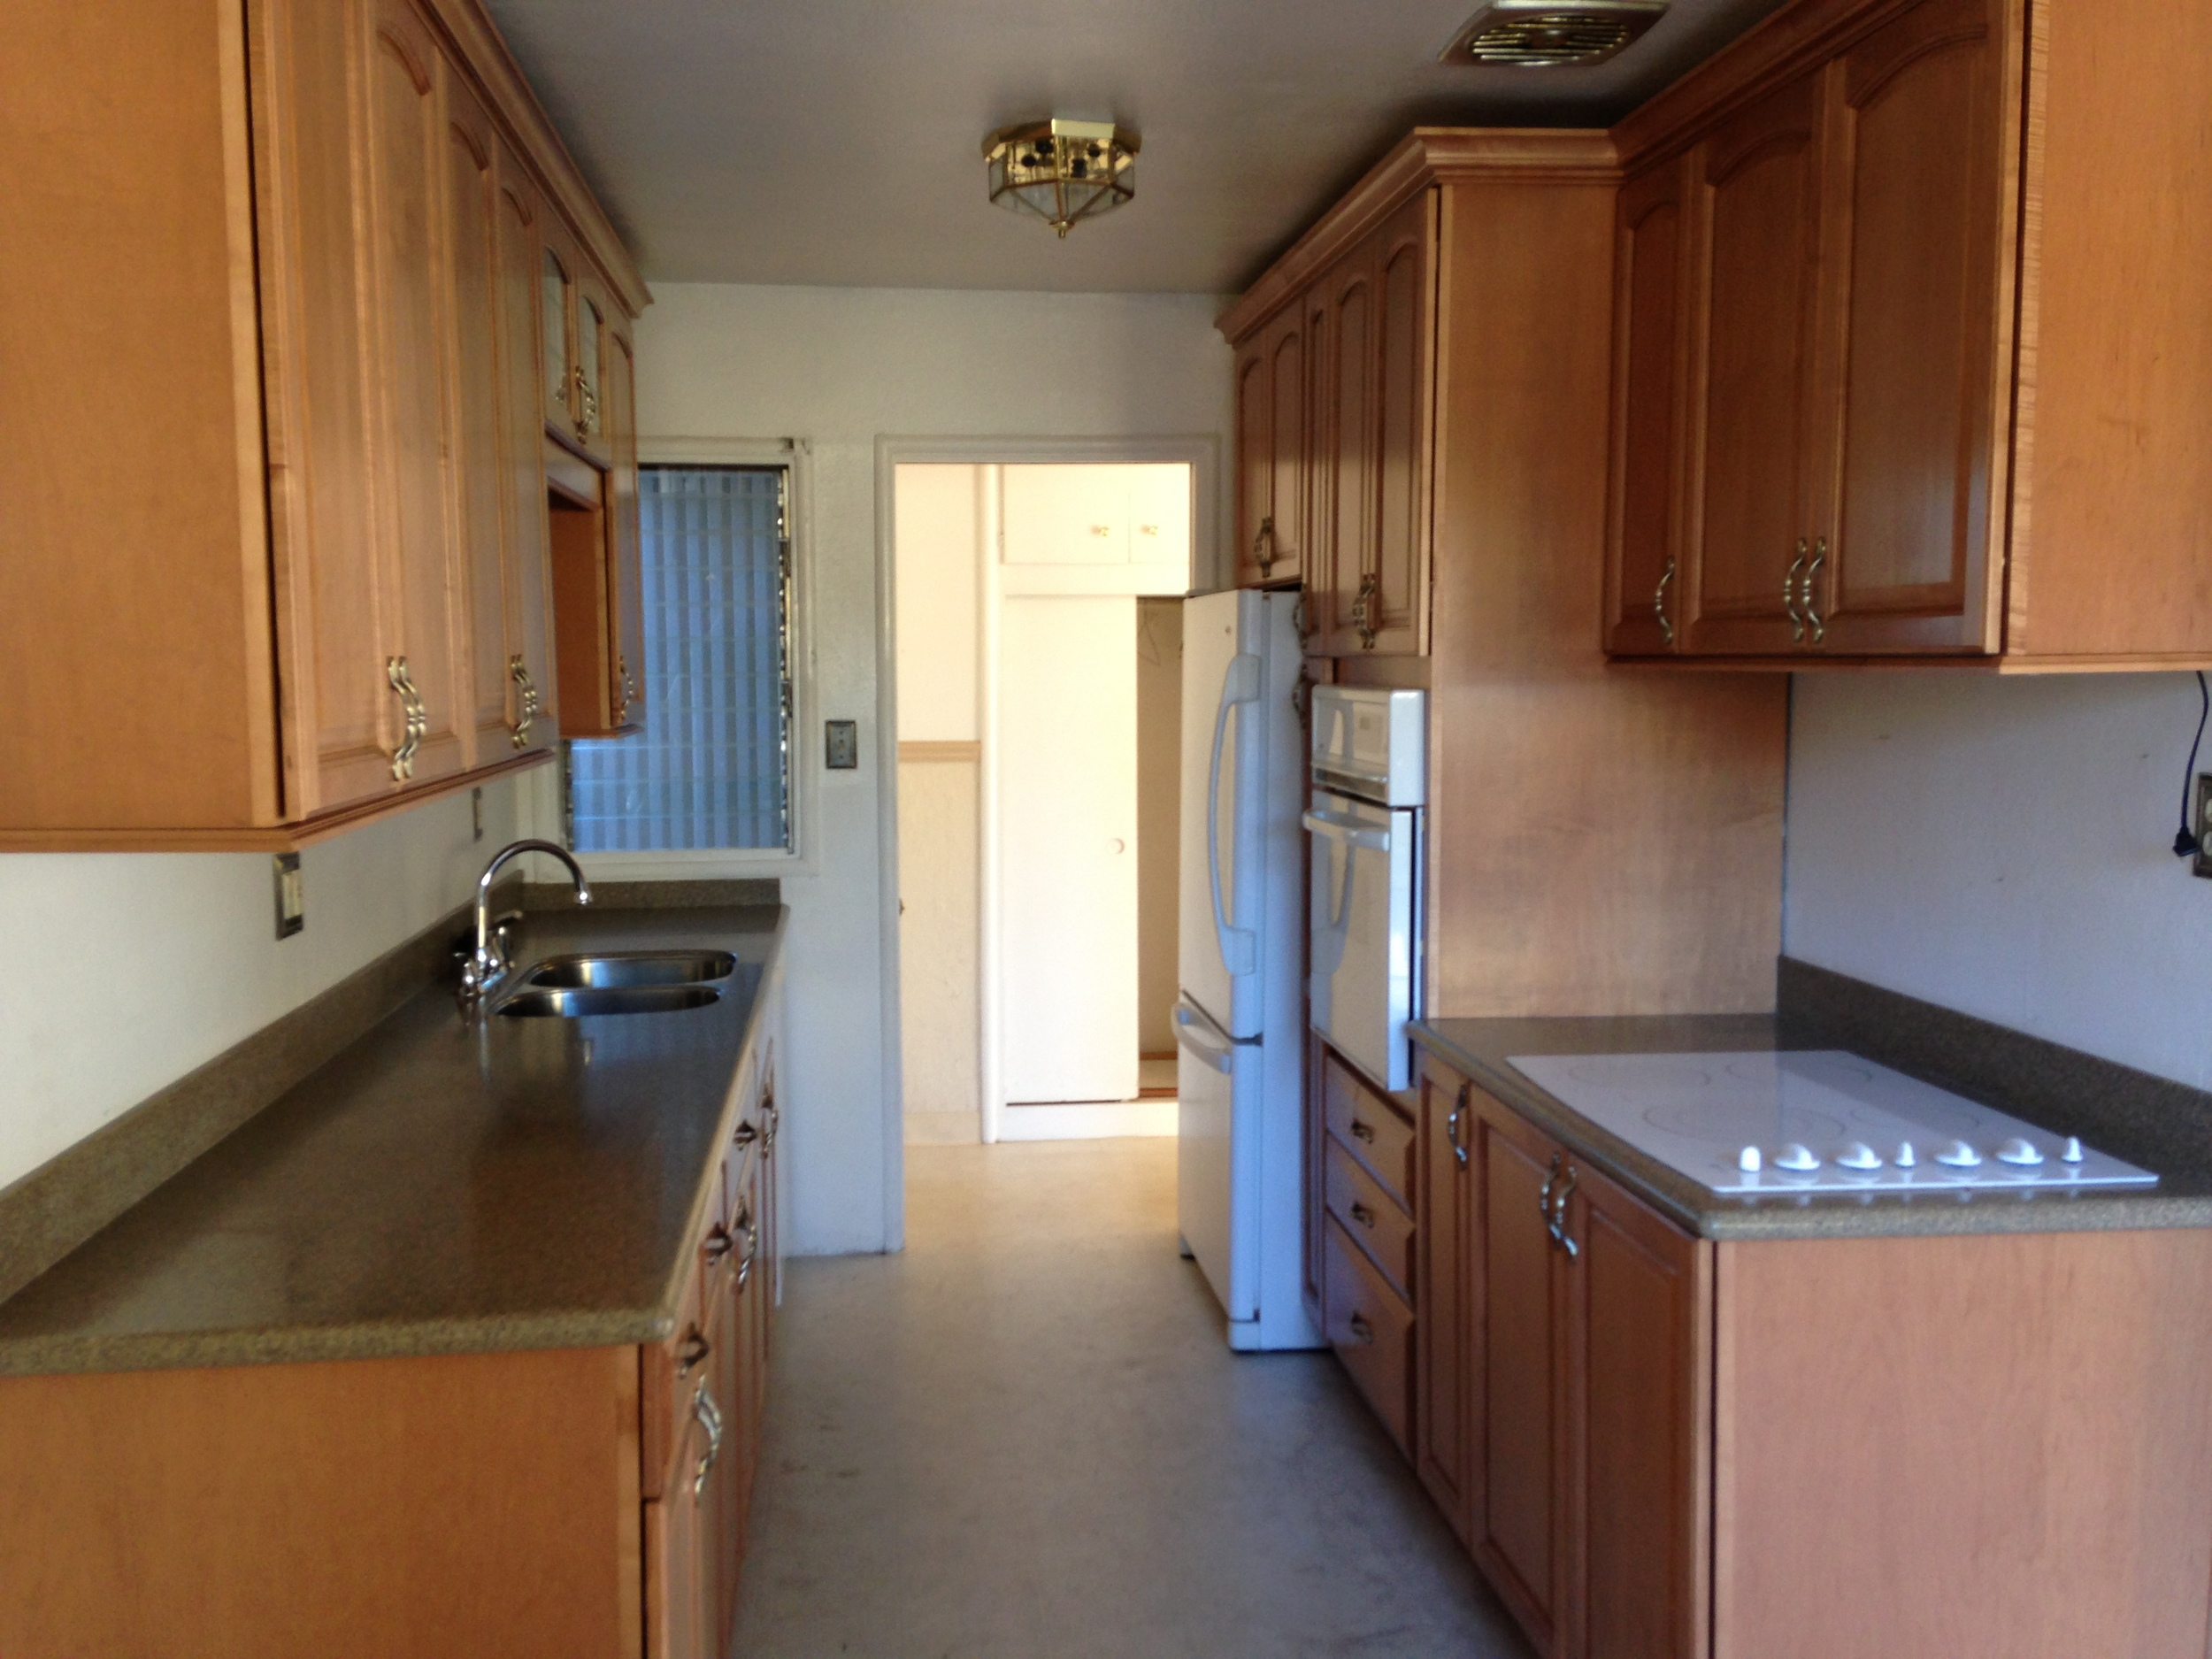 kitchenview 2.JPG